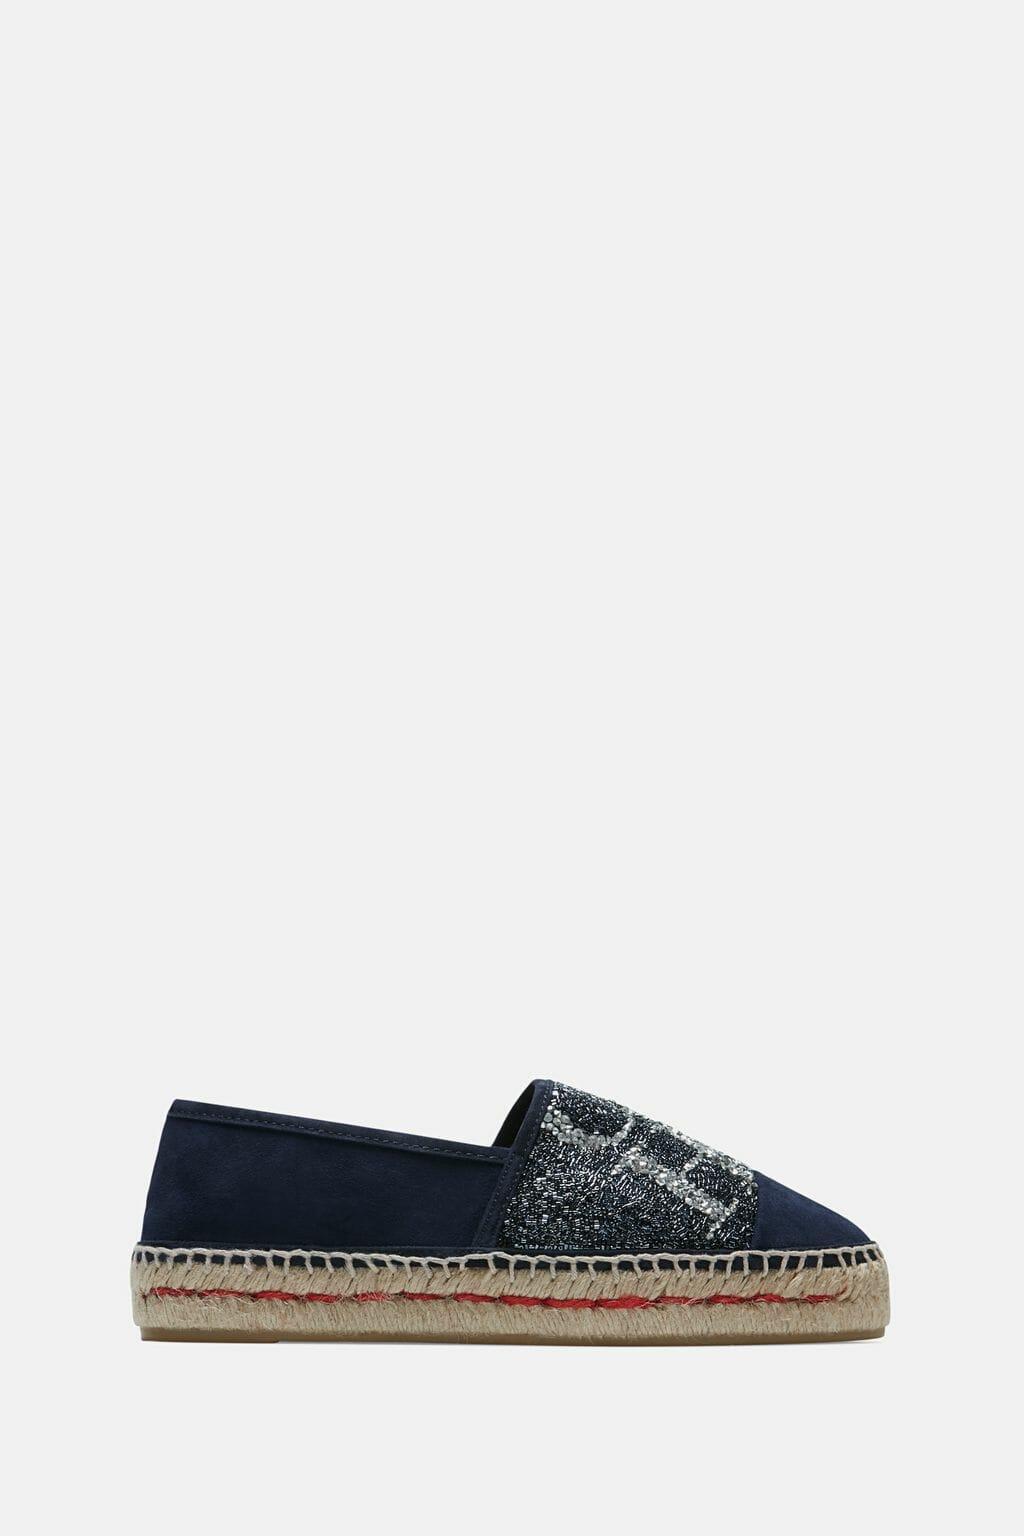 CH-Carolina-herrera-shoes-collection-Spring-Summer-2018-shoe-87